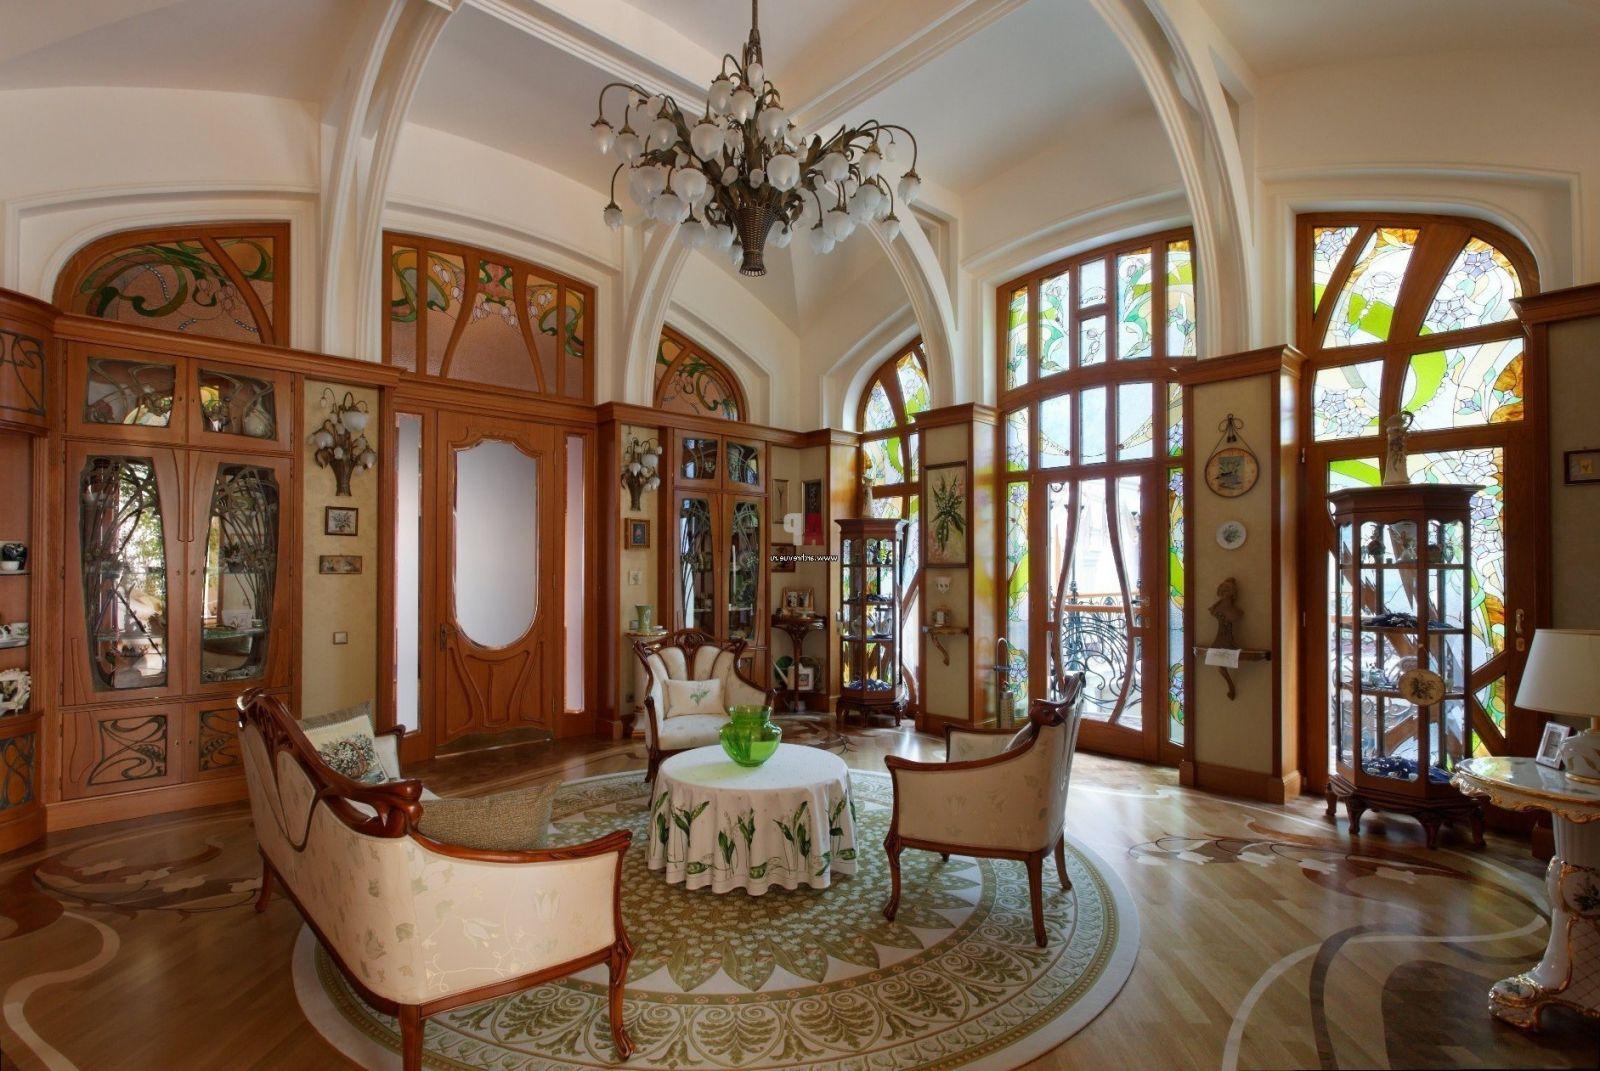 Art Nouveau Estilo De Arte De Dise O De Interiores  ~ Decoracion Modernista Interiores